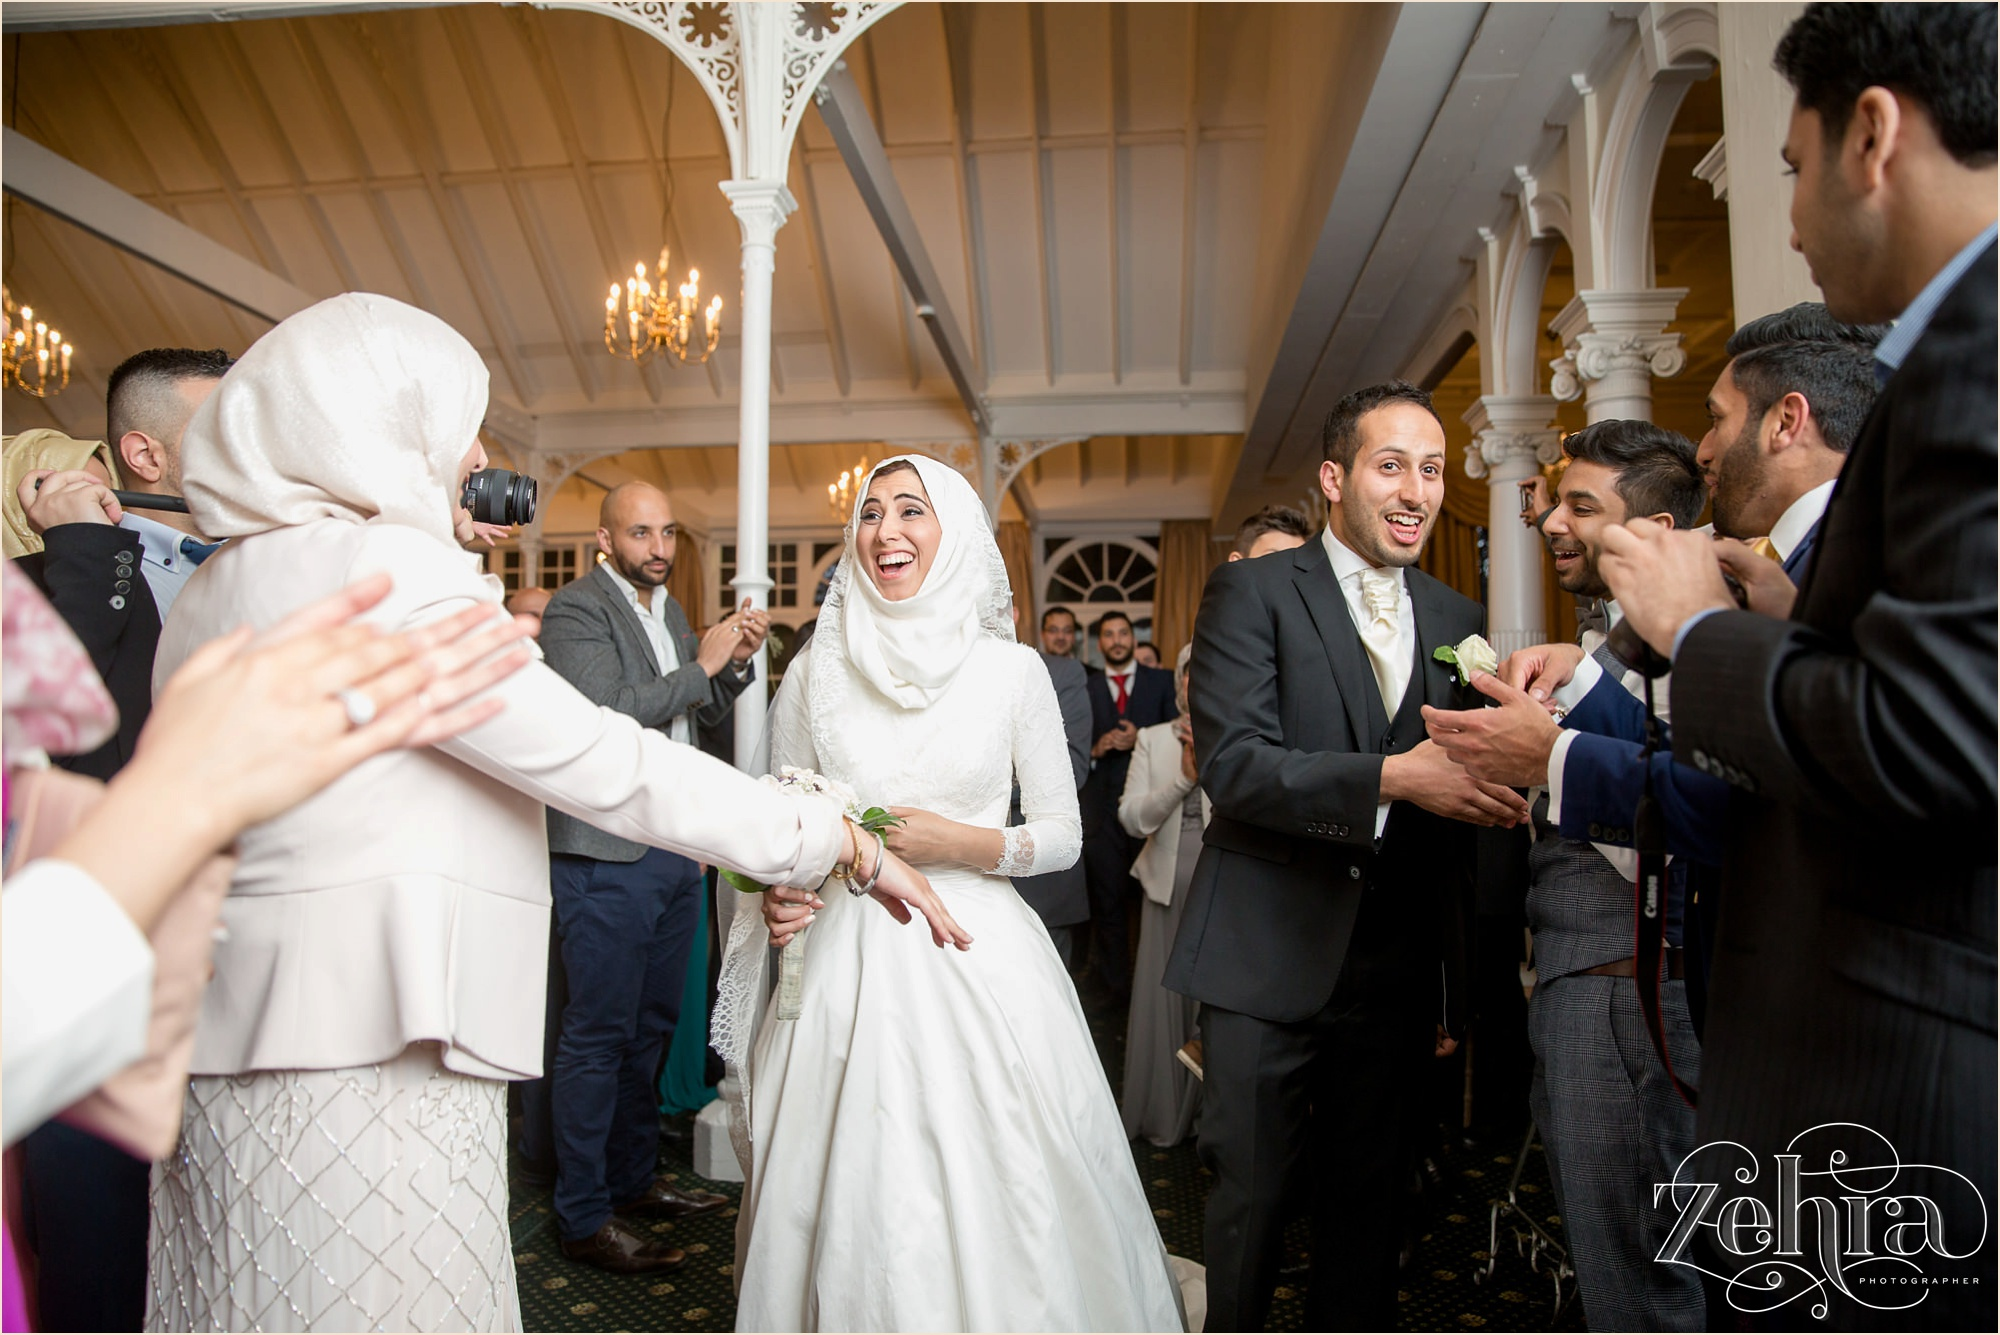 jasira manchester wedding photographer_0125.jpg